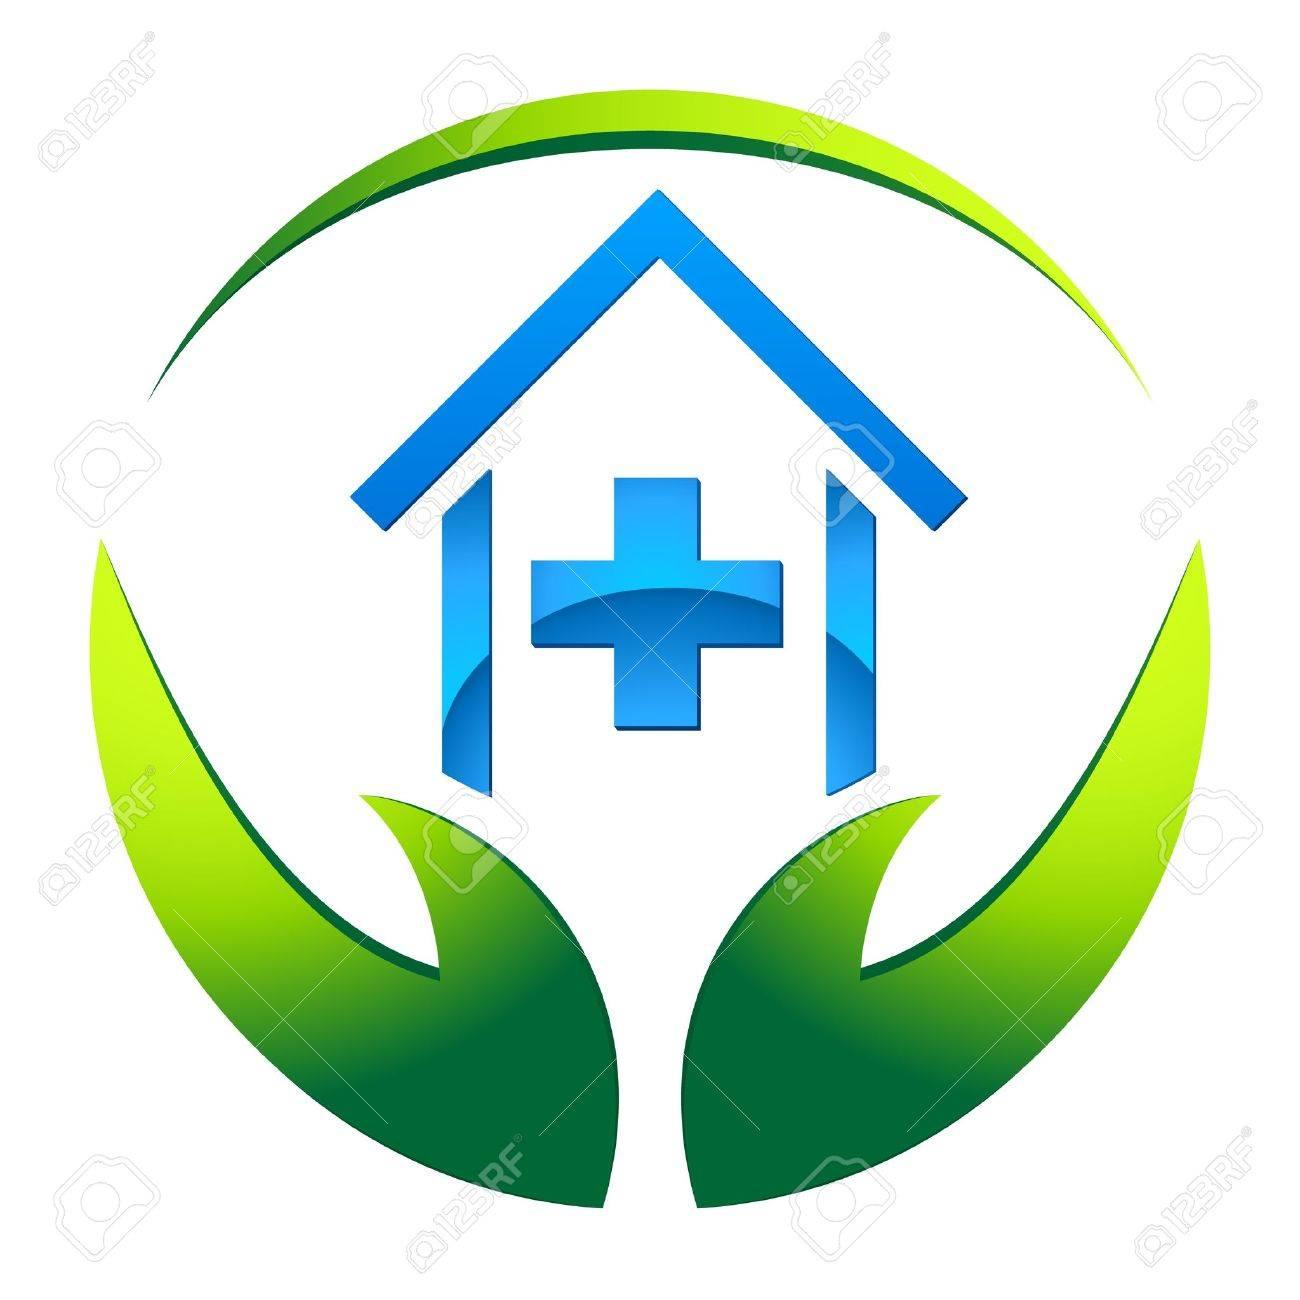 medical icon - 22083385